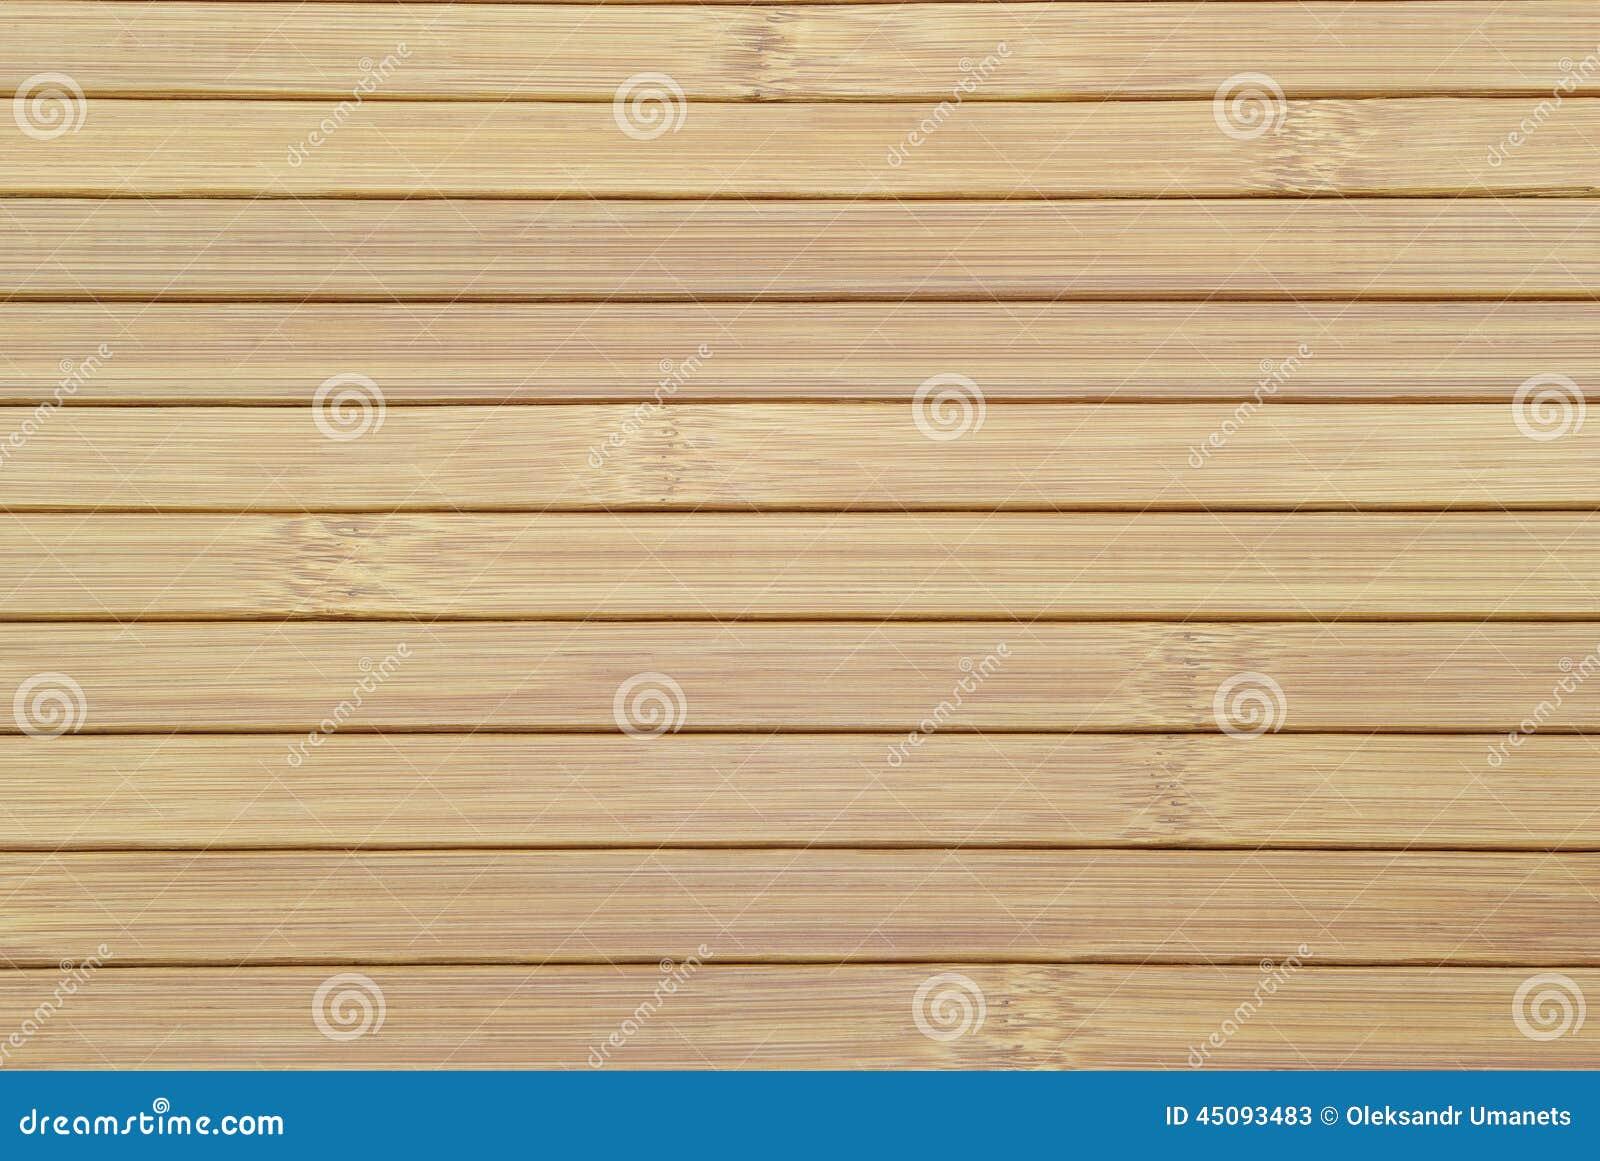 Textura de los listones de madera del bamb imagen de - Liston de madera ...